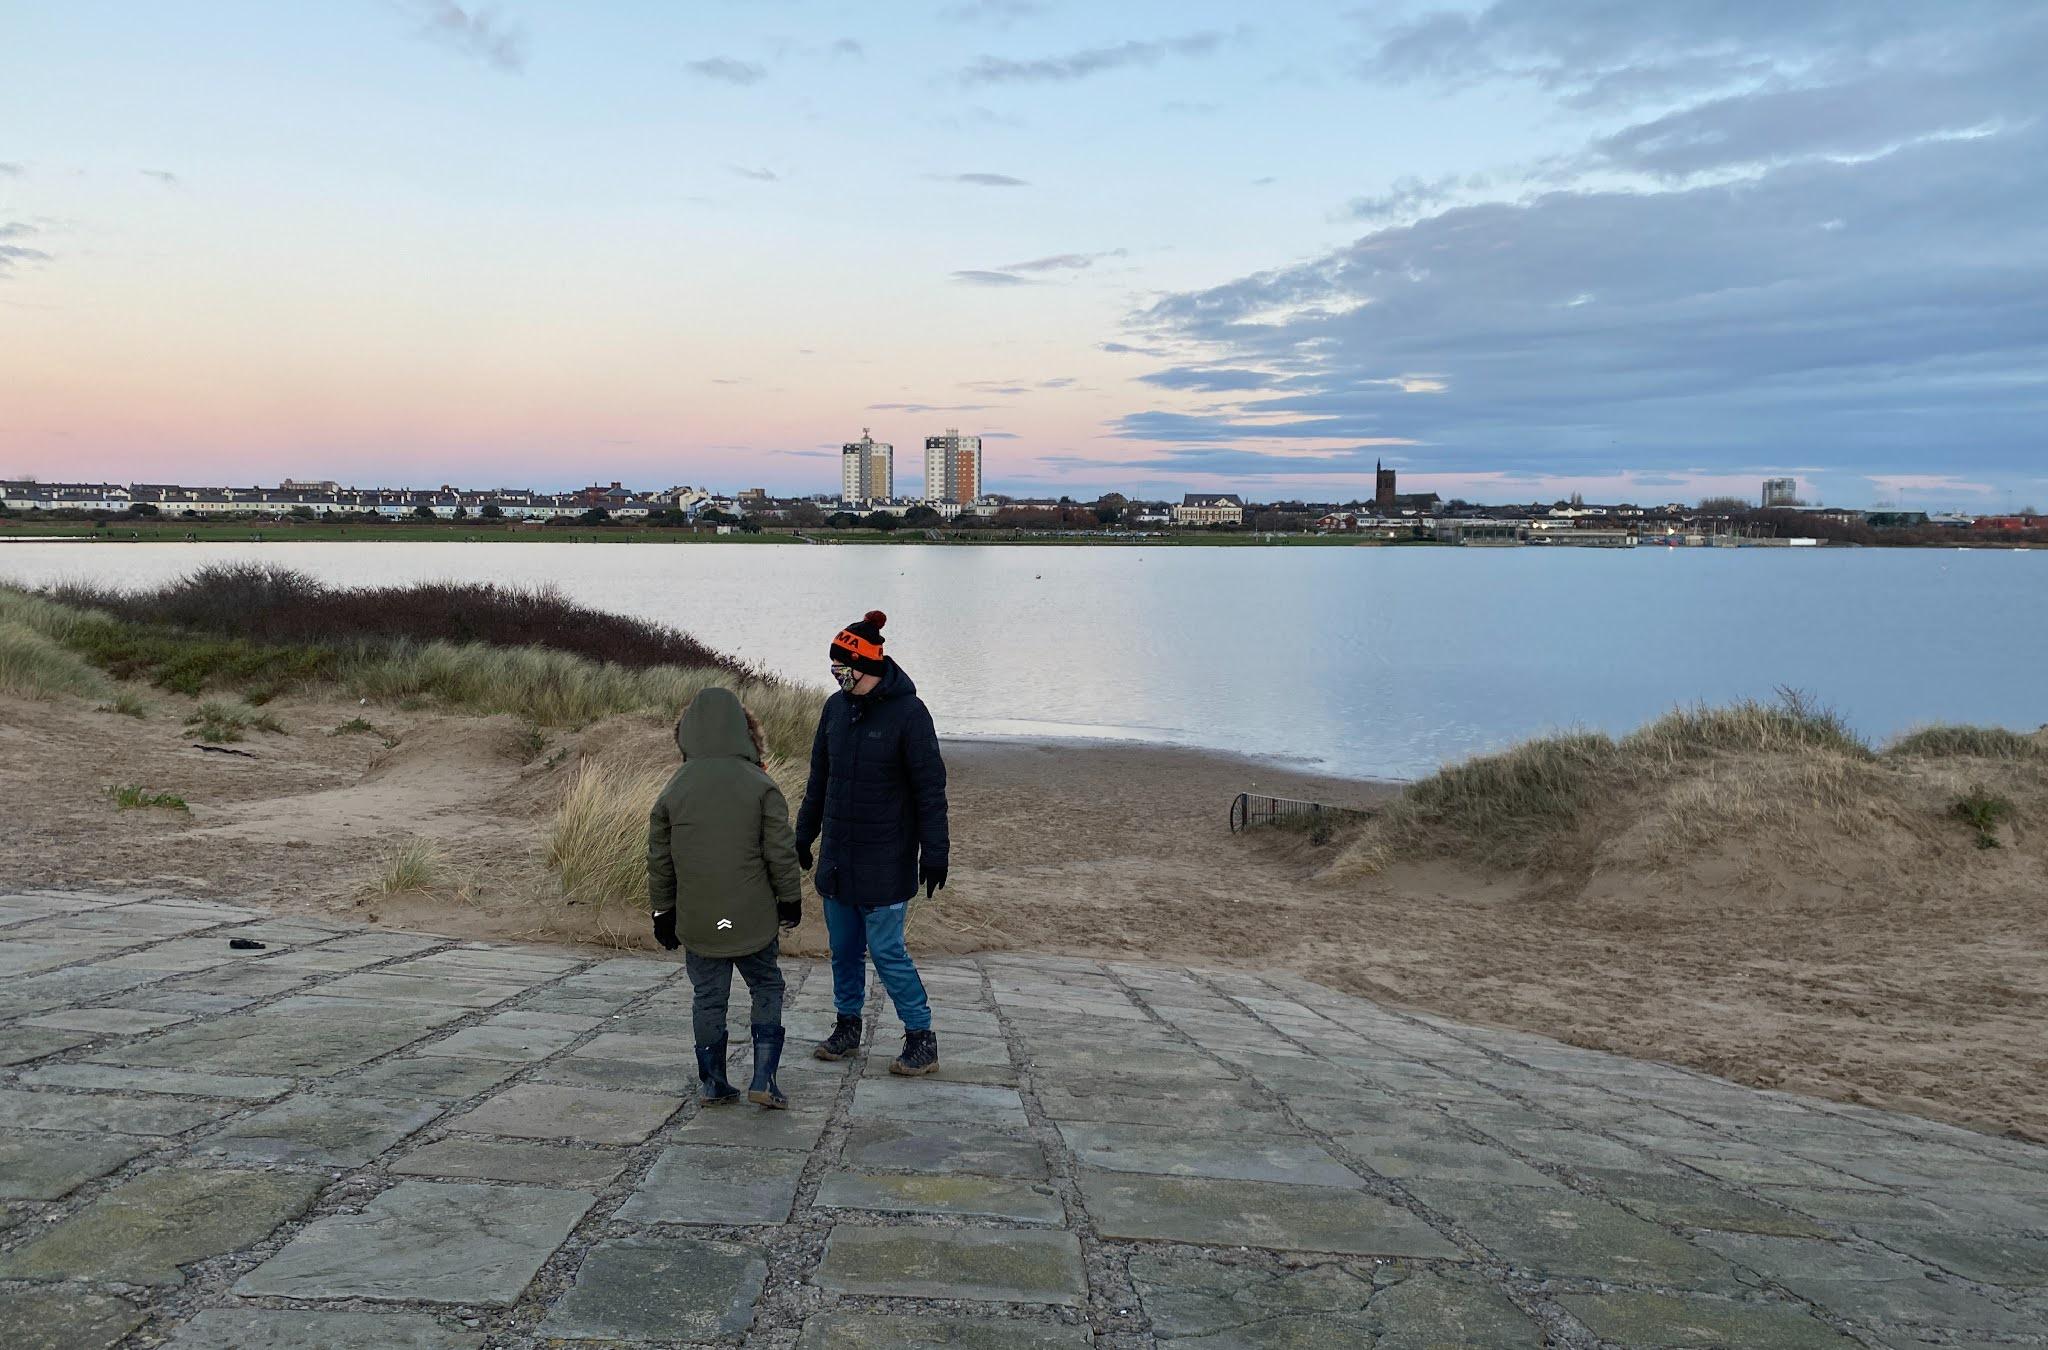 boy and dad waling by a marina